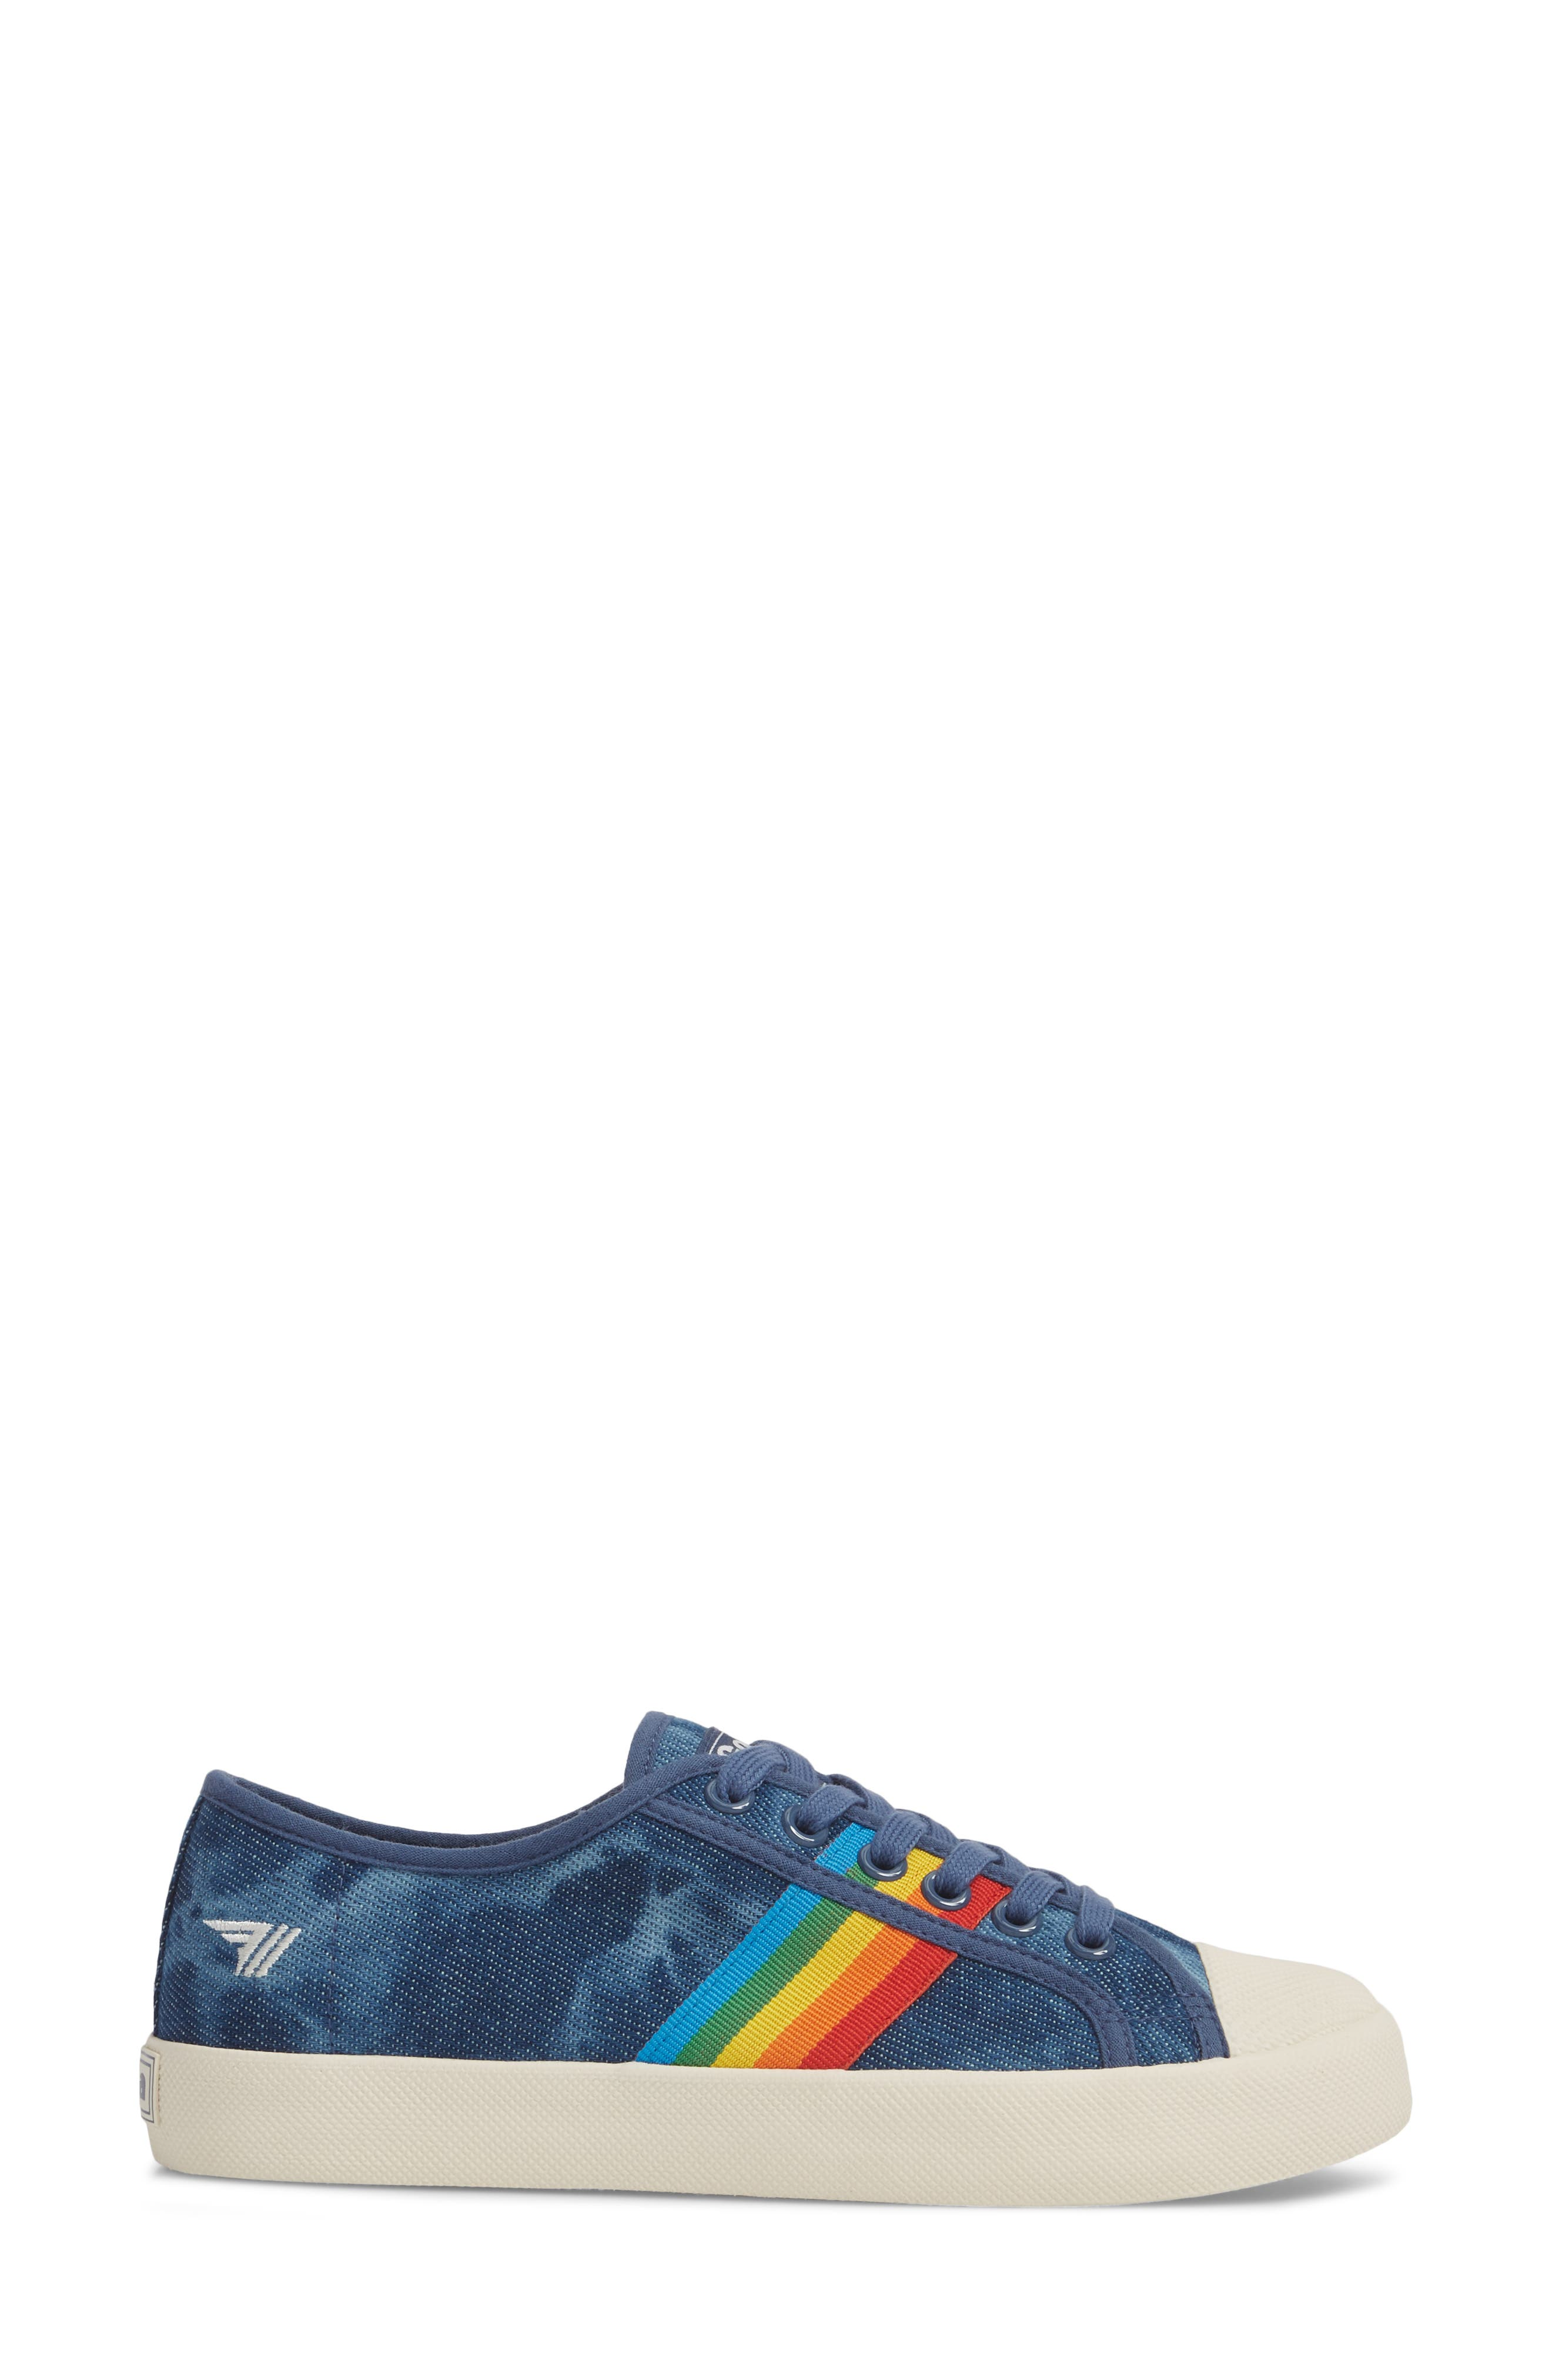 Alternate Image 3  - Gola Coaster Rainbow Striped Sneaker (Women)